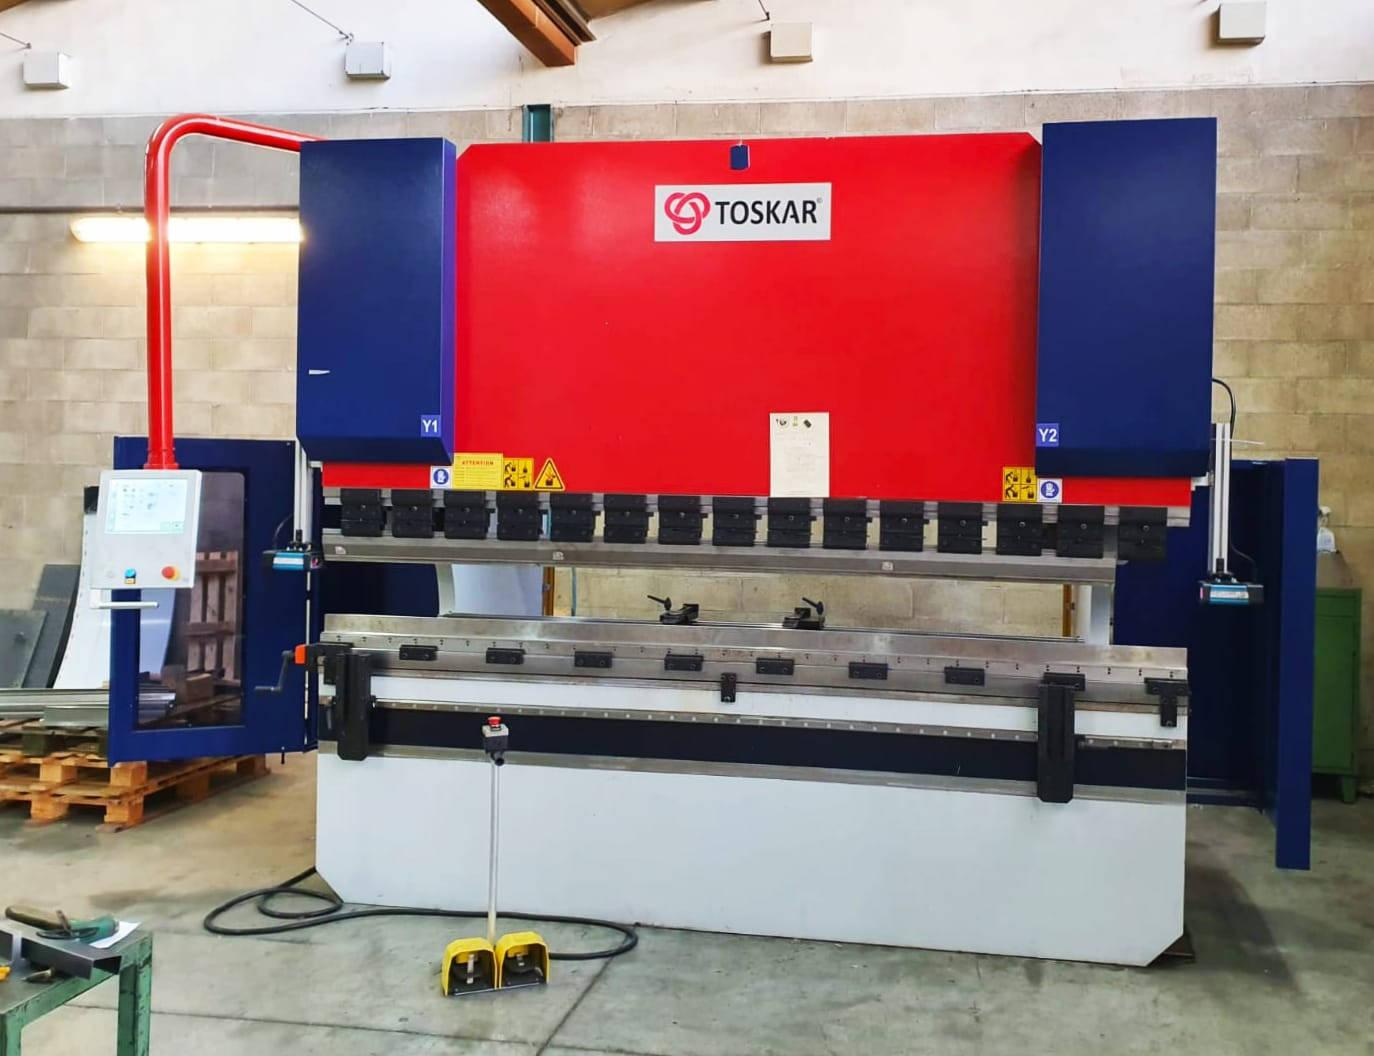 piegatrice toskar 3100 mm x 175 ton .jpg